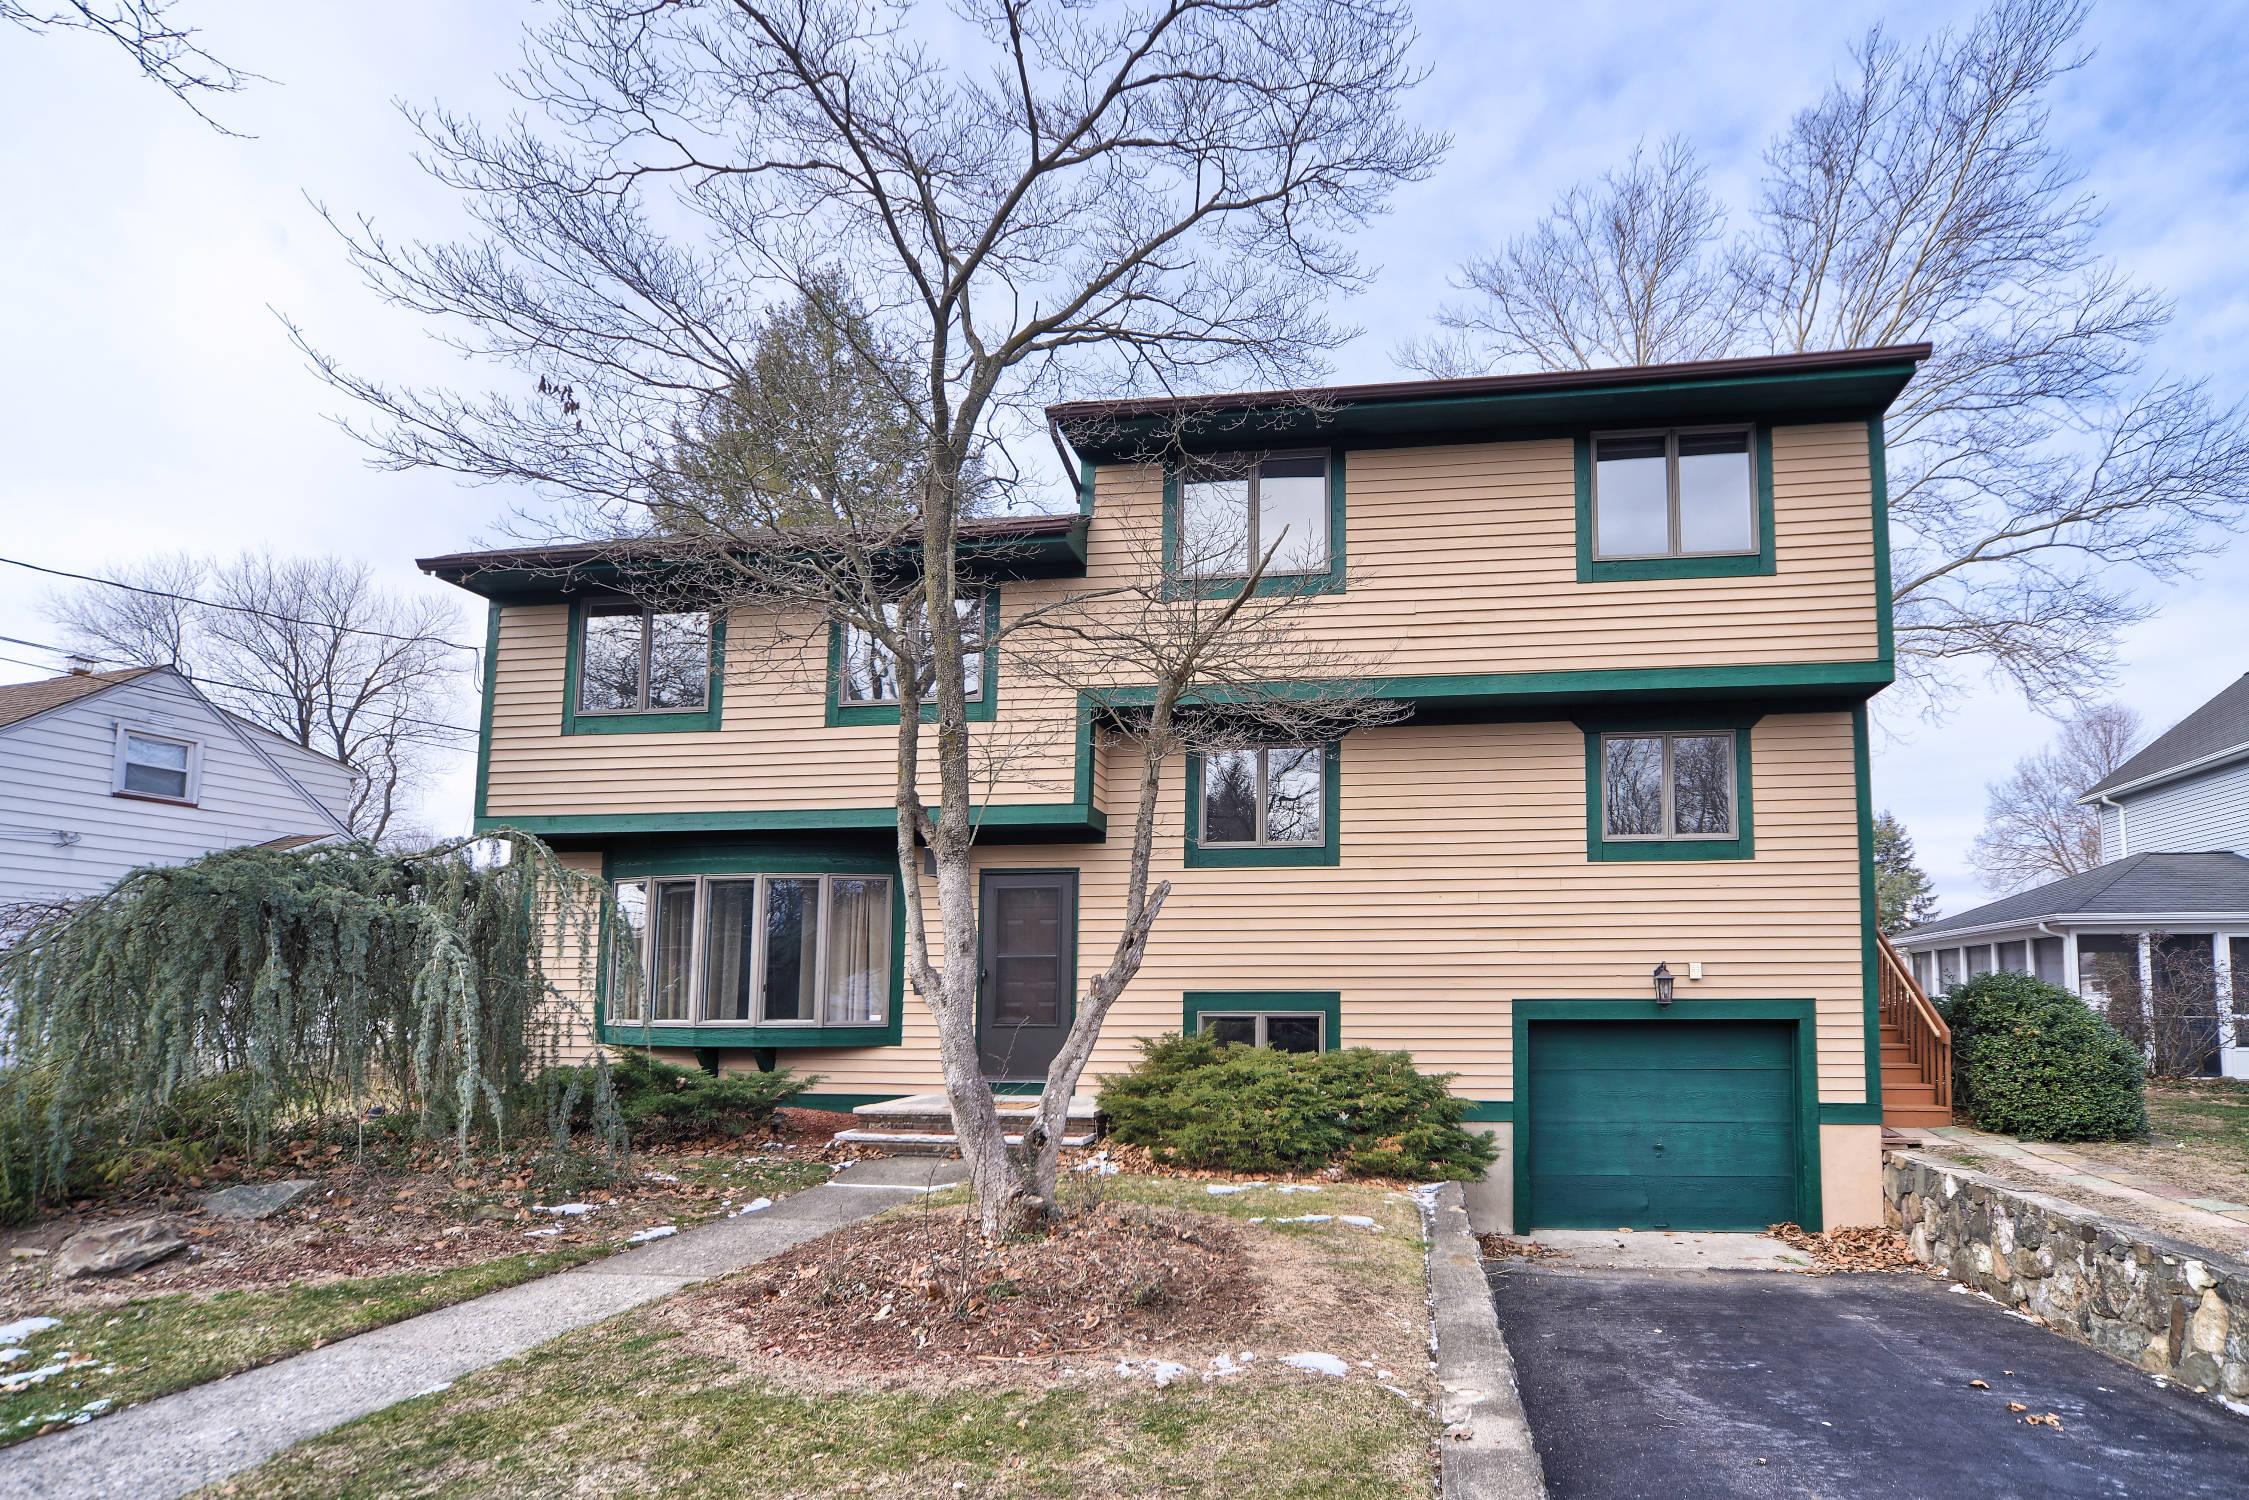 Pompton lks nj multi level home for sale 444 900 for Multi level homes for sale